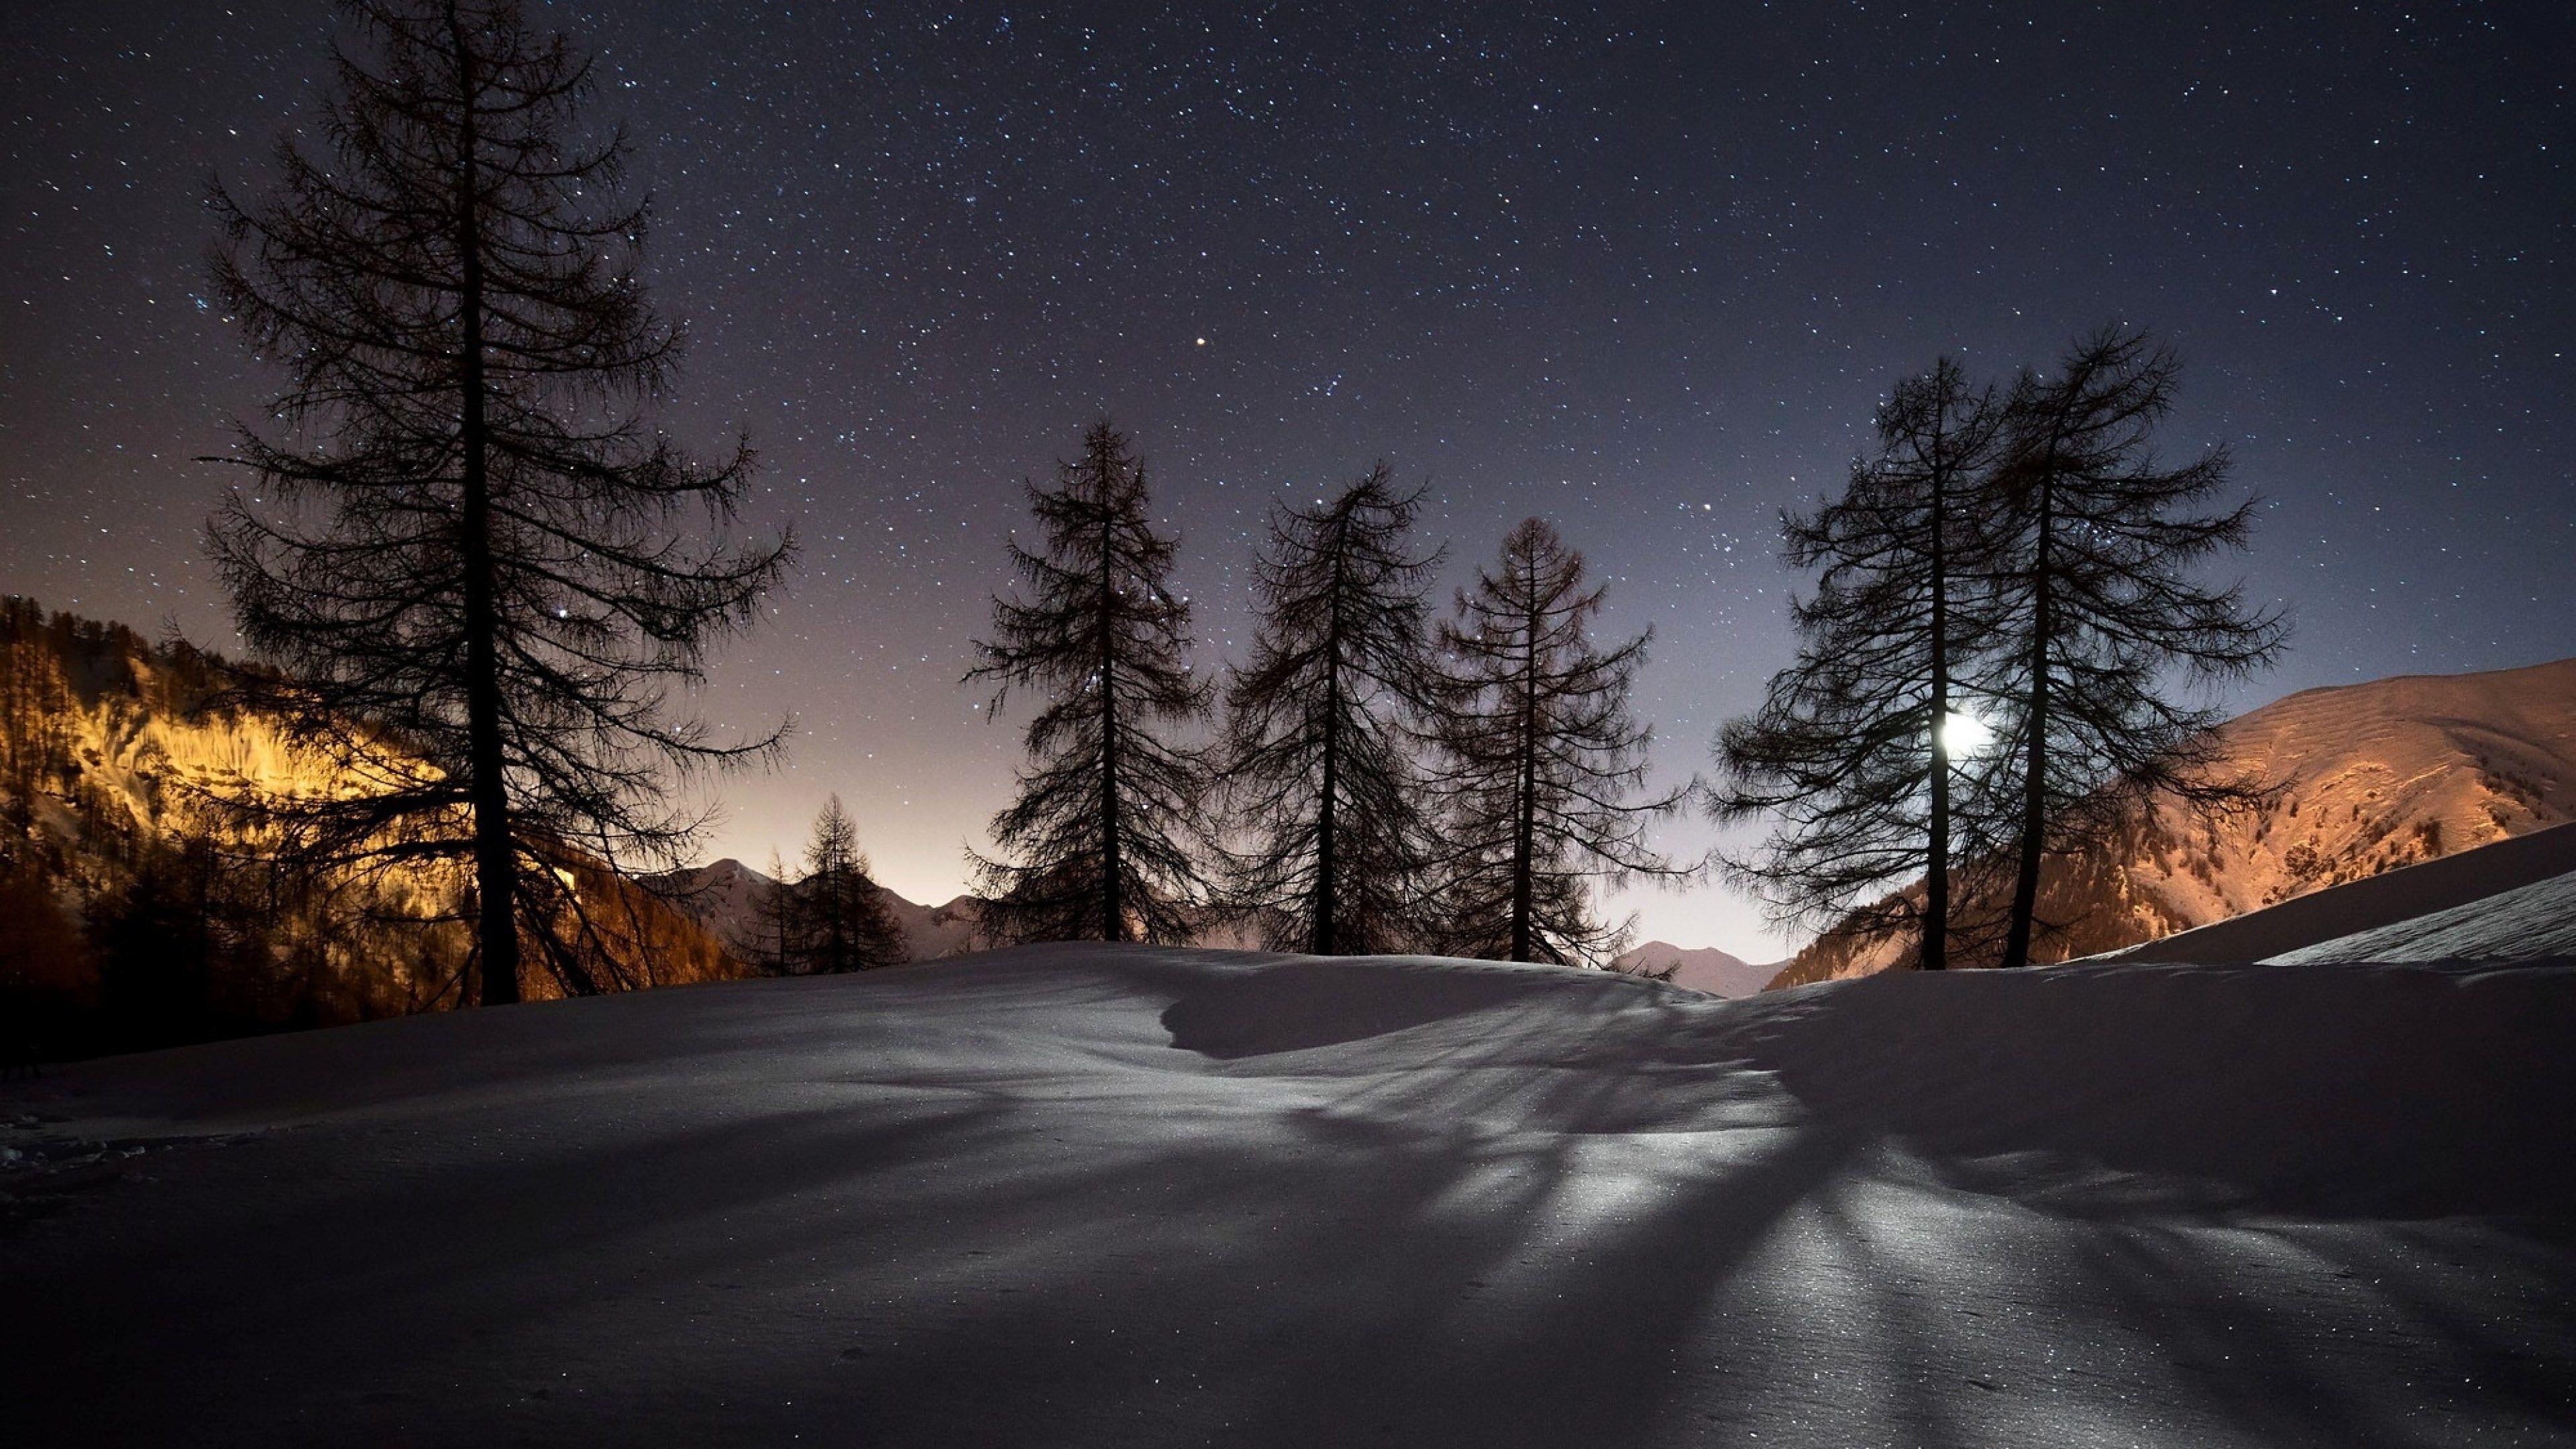 Winter 4k Pc Desktop 4k Wallpaper Hdwallpaper Desktop Night Landscape Winter Wallpaper Landscape Wallpaper